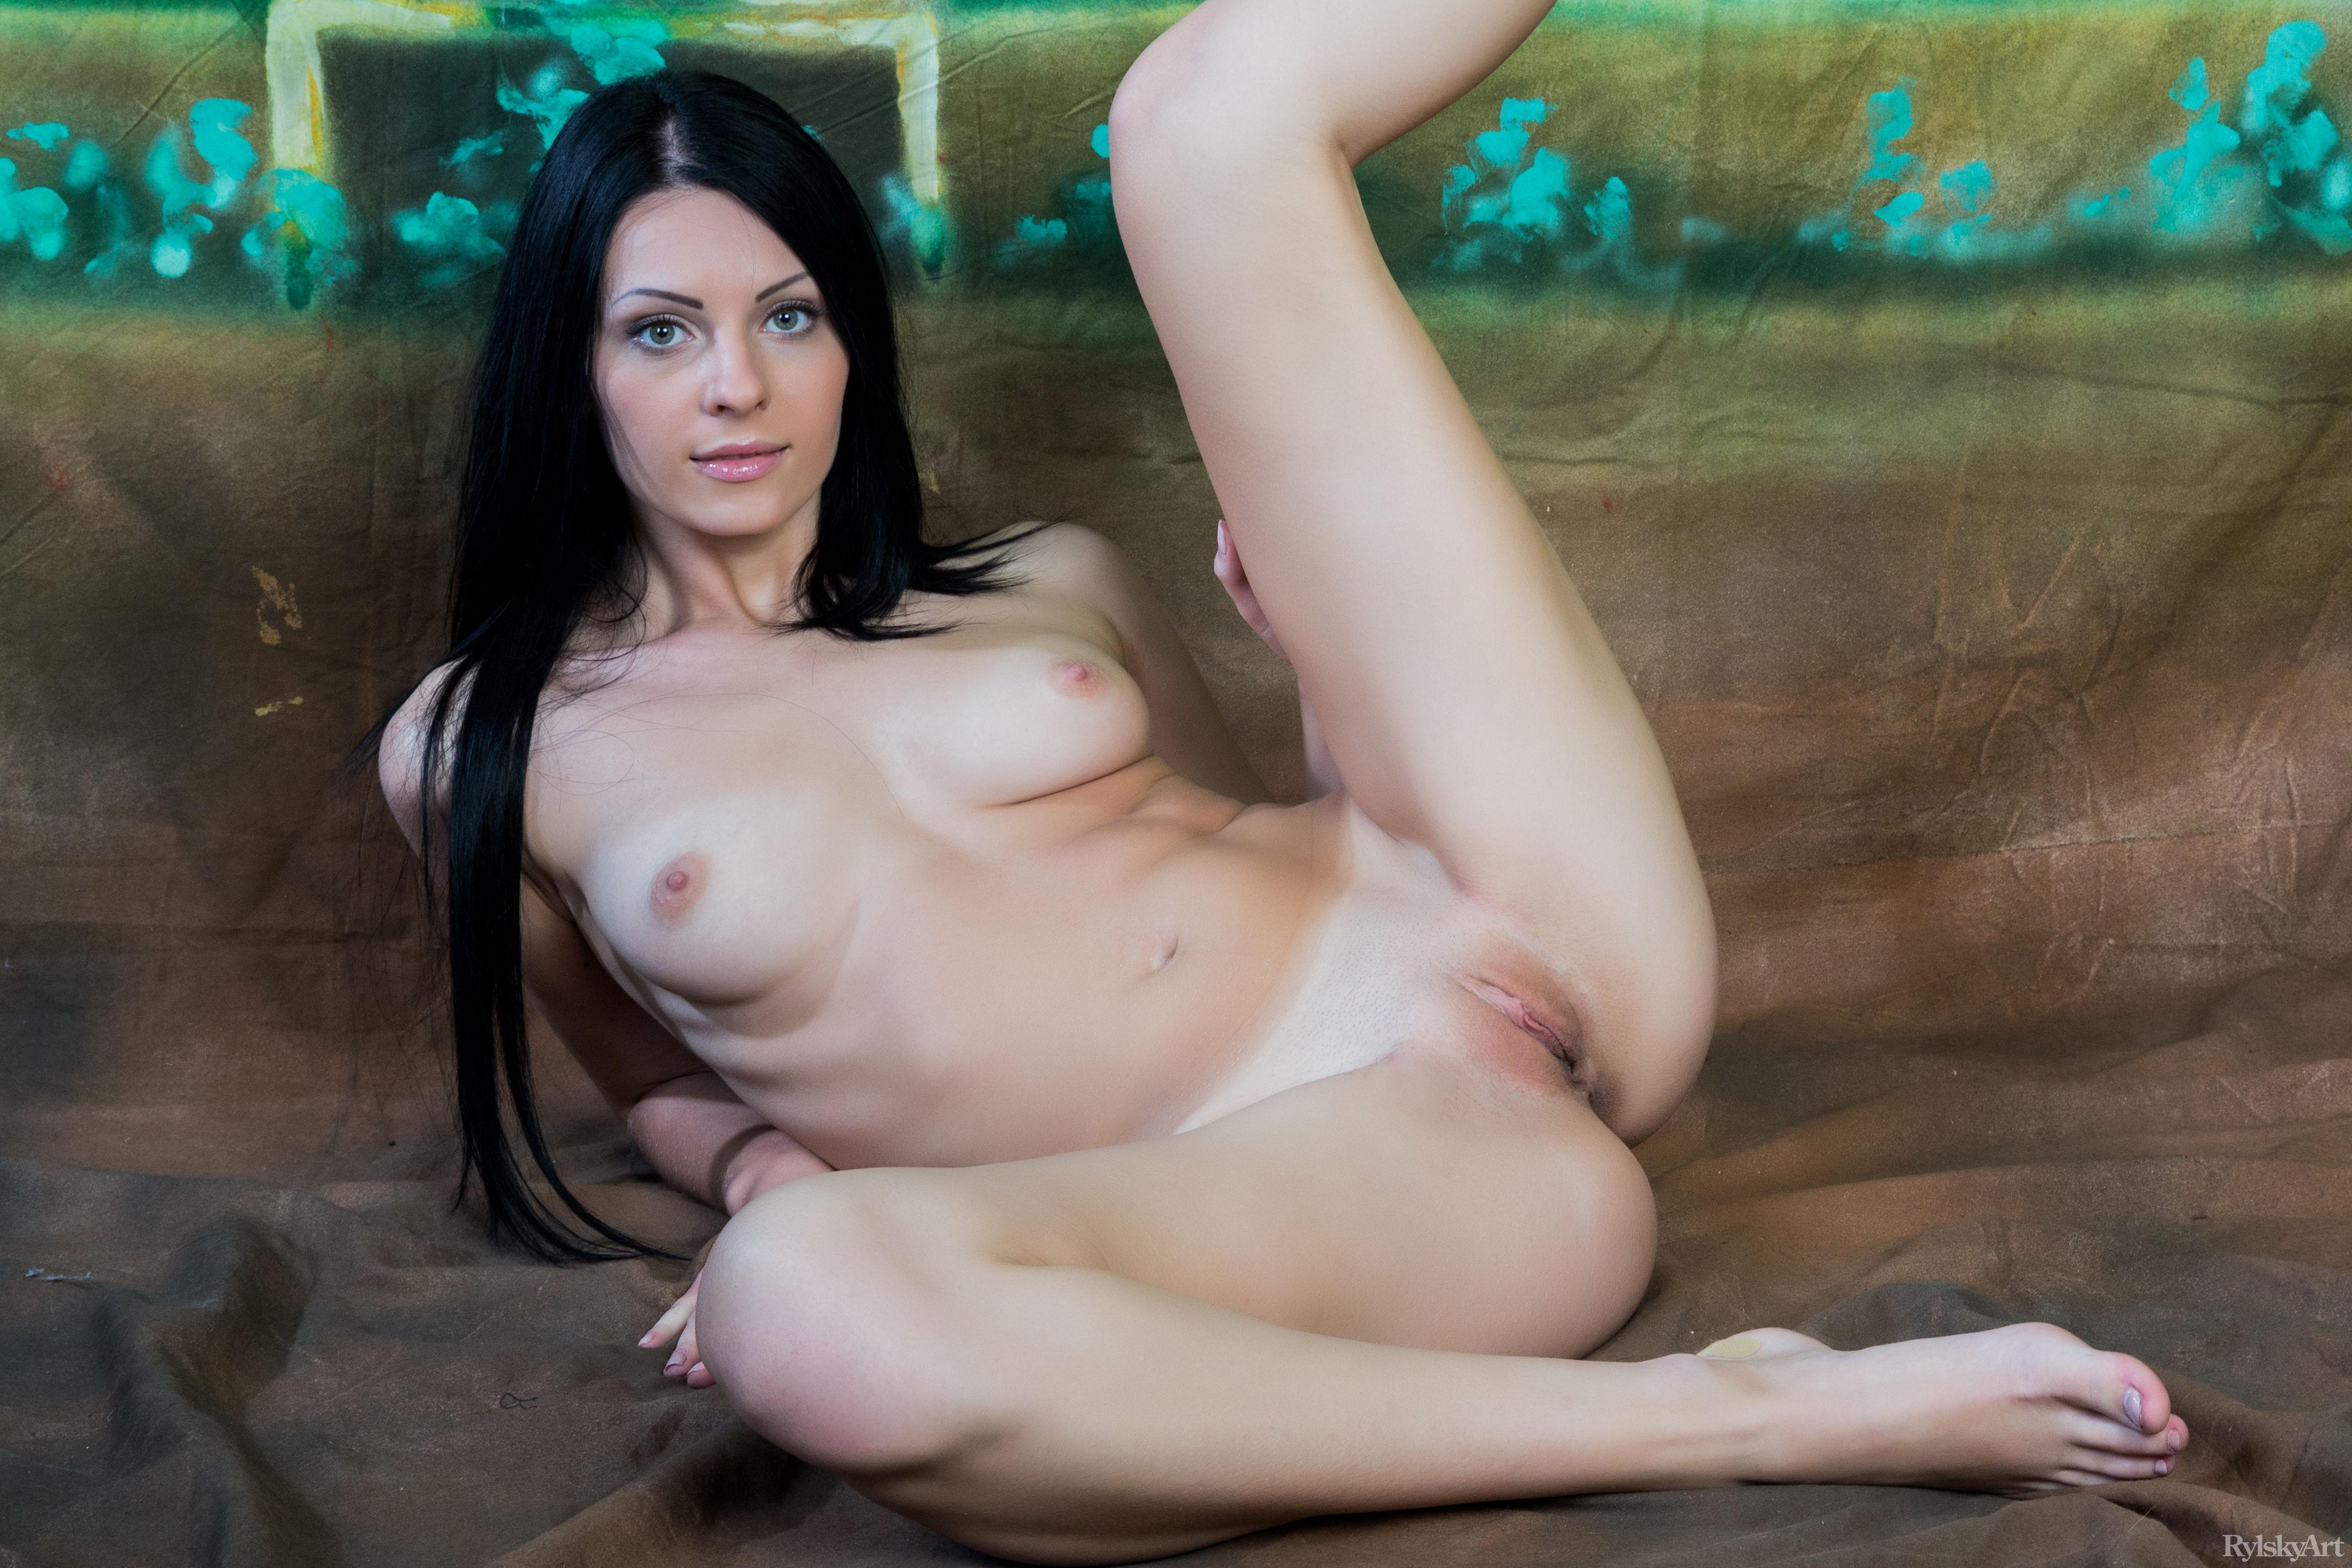 Indian girl hidden cam nude pic